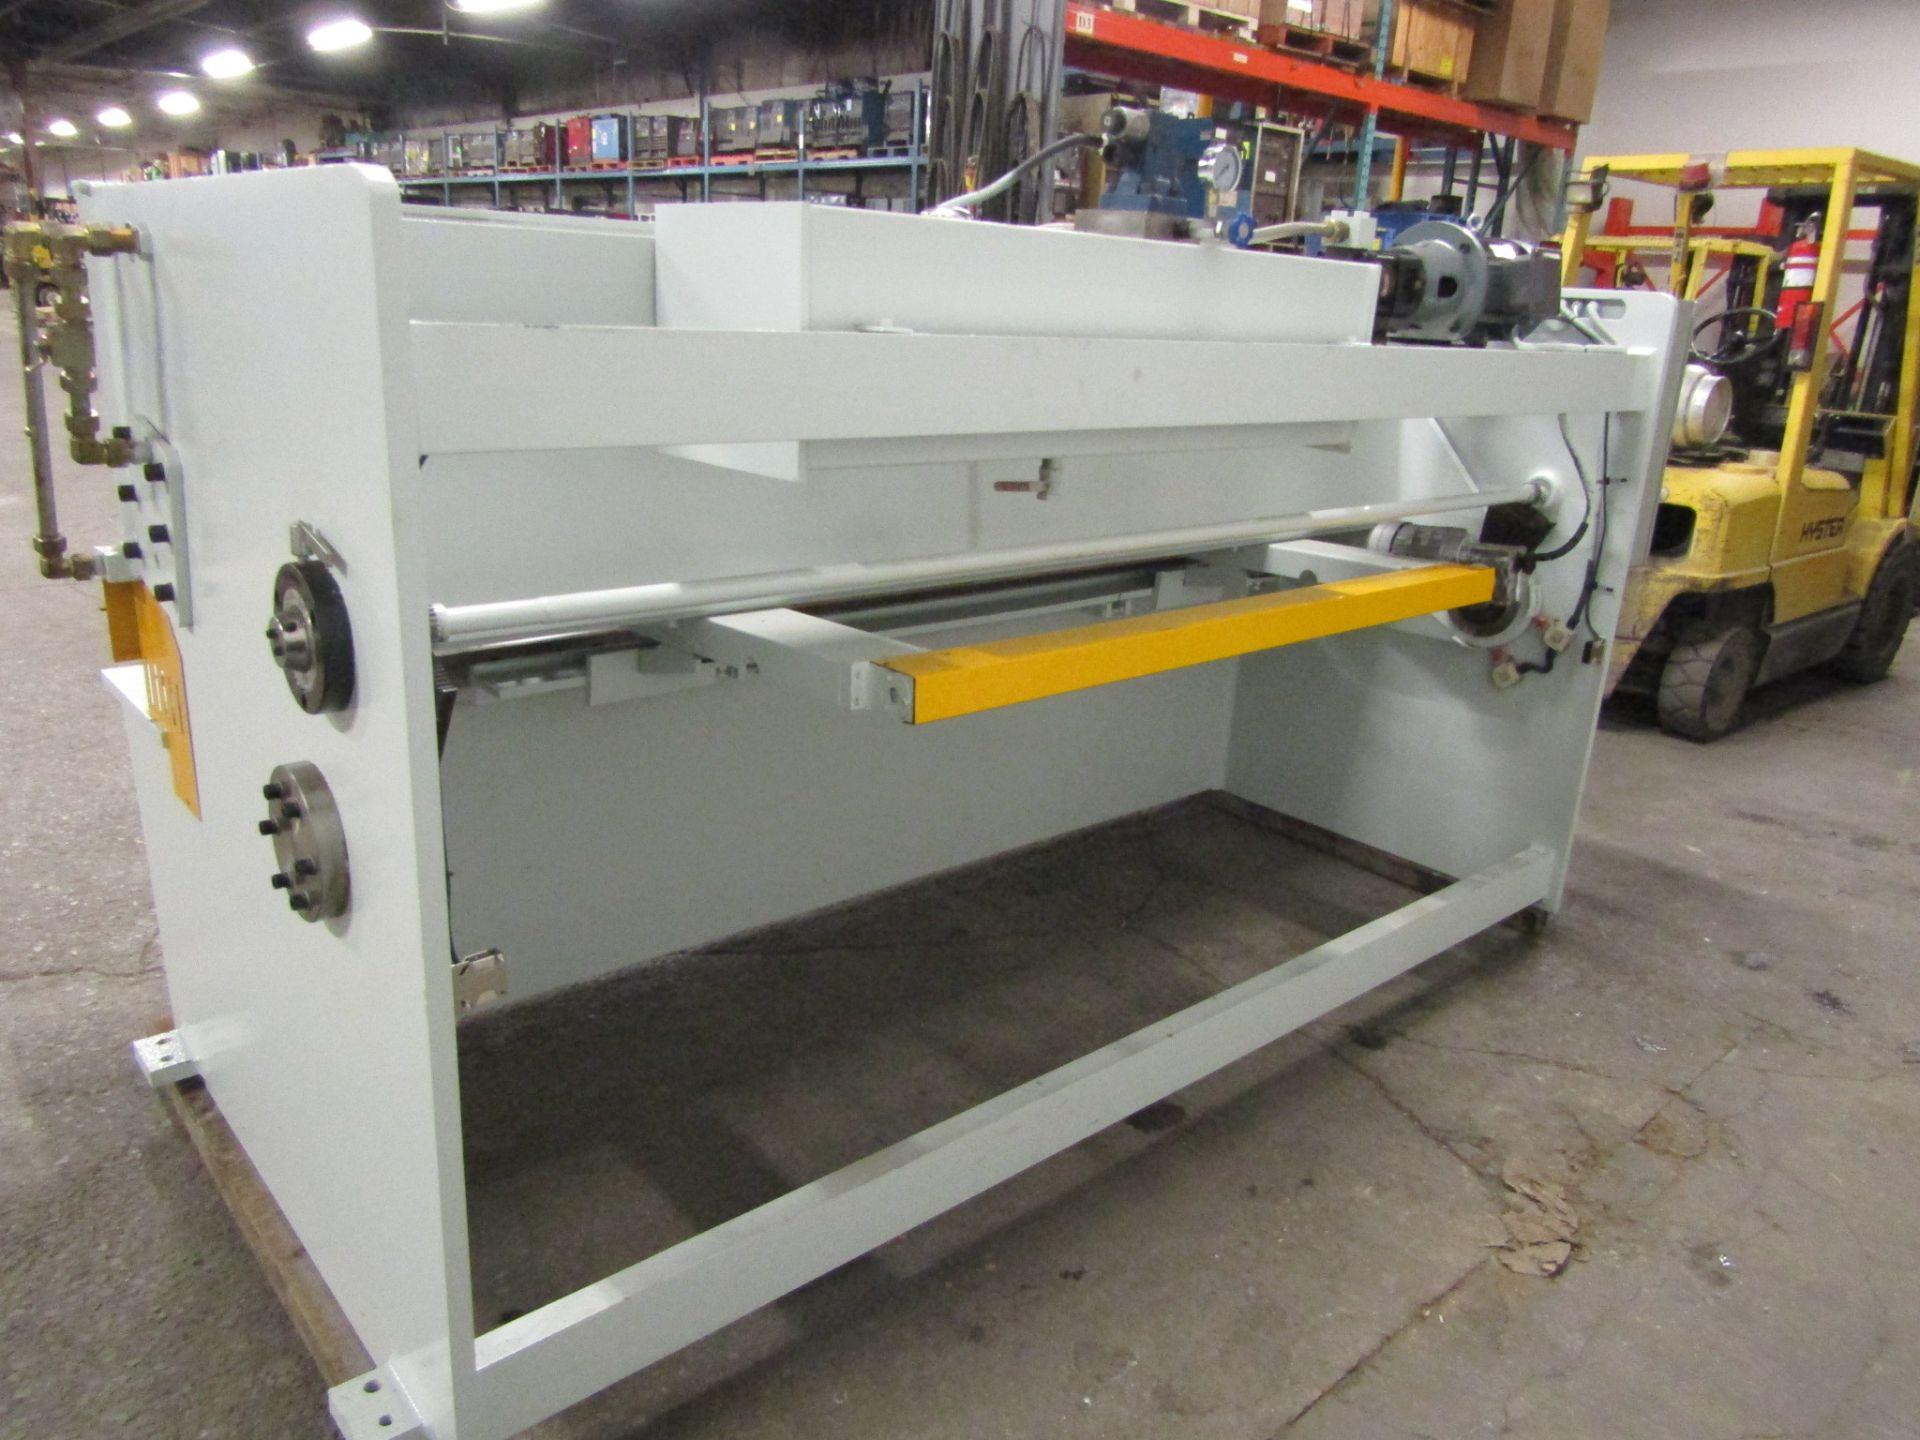 "Bernardo Hydraulic Shear 3/16"" max capacity 98"" width - 480/575V 3 phase MINT UNUSED UNIT complete - Image 4 of 6"